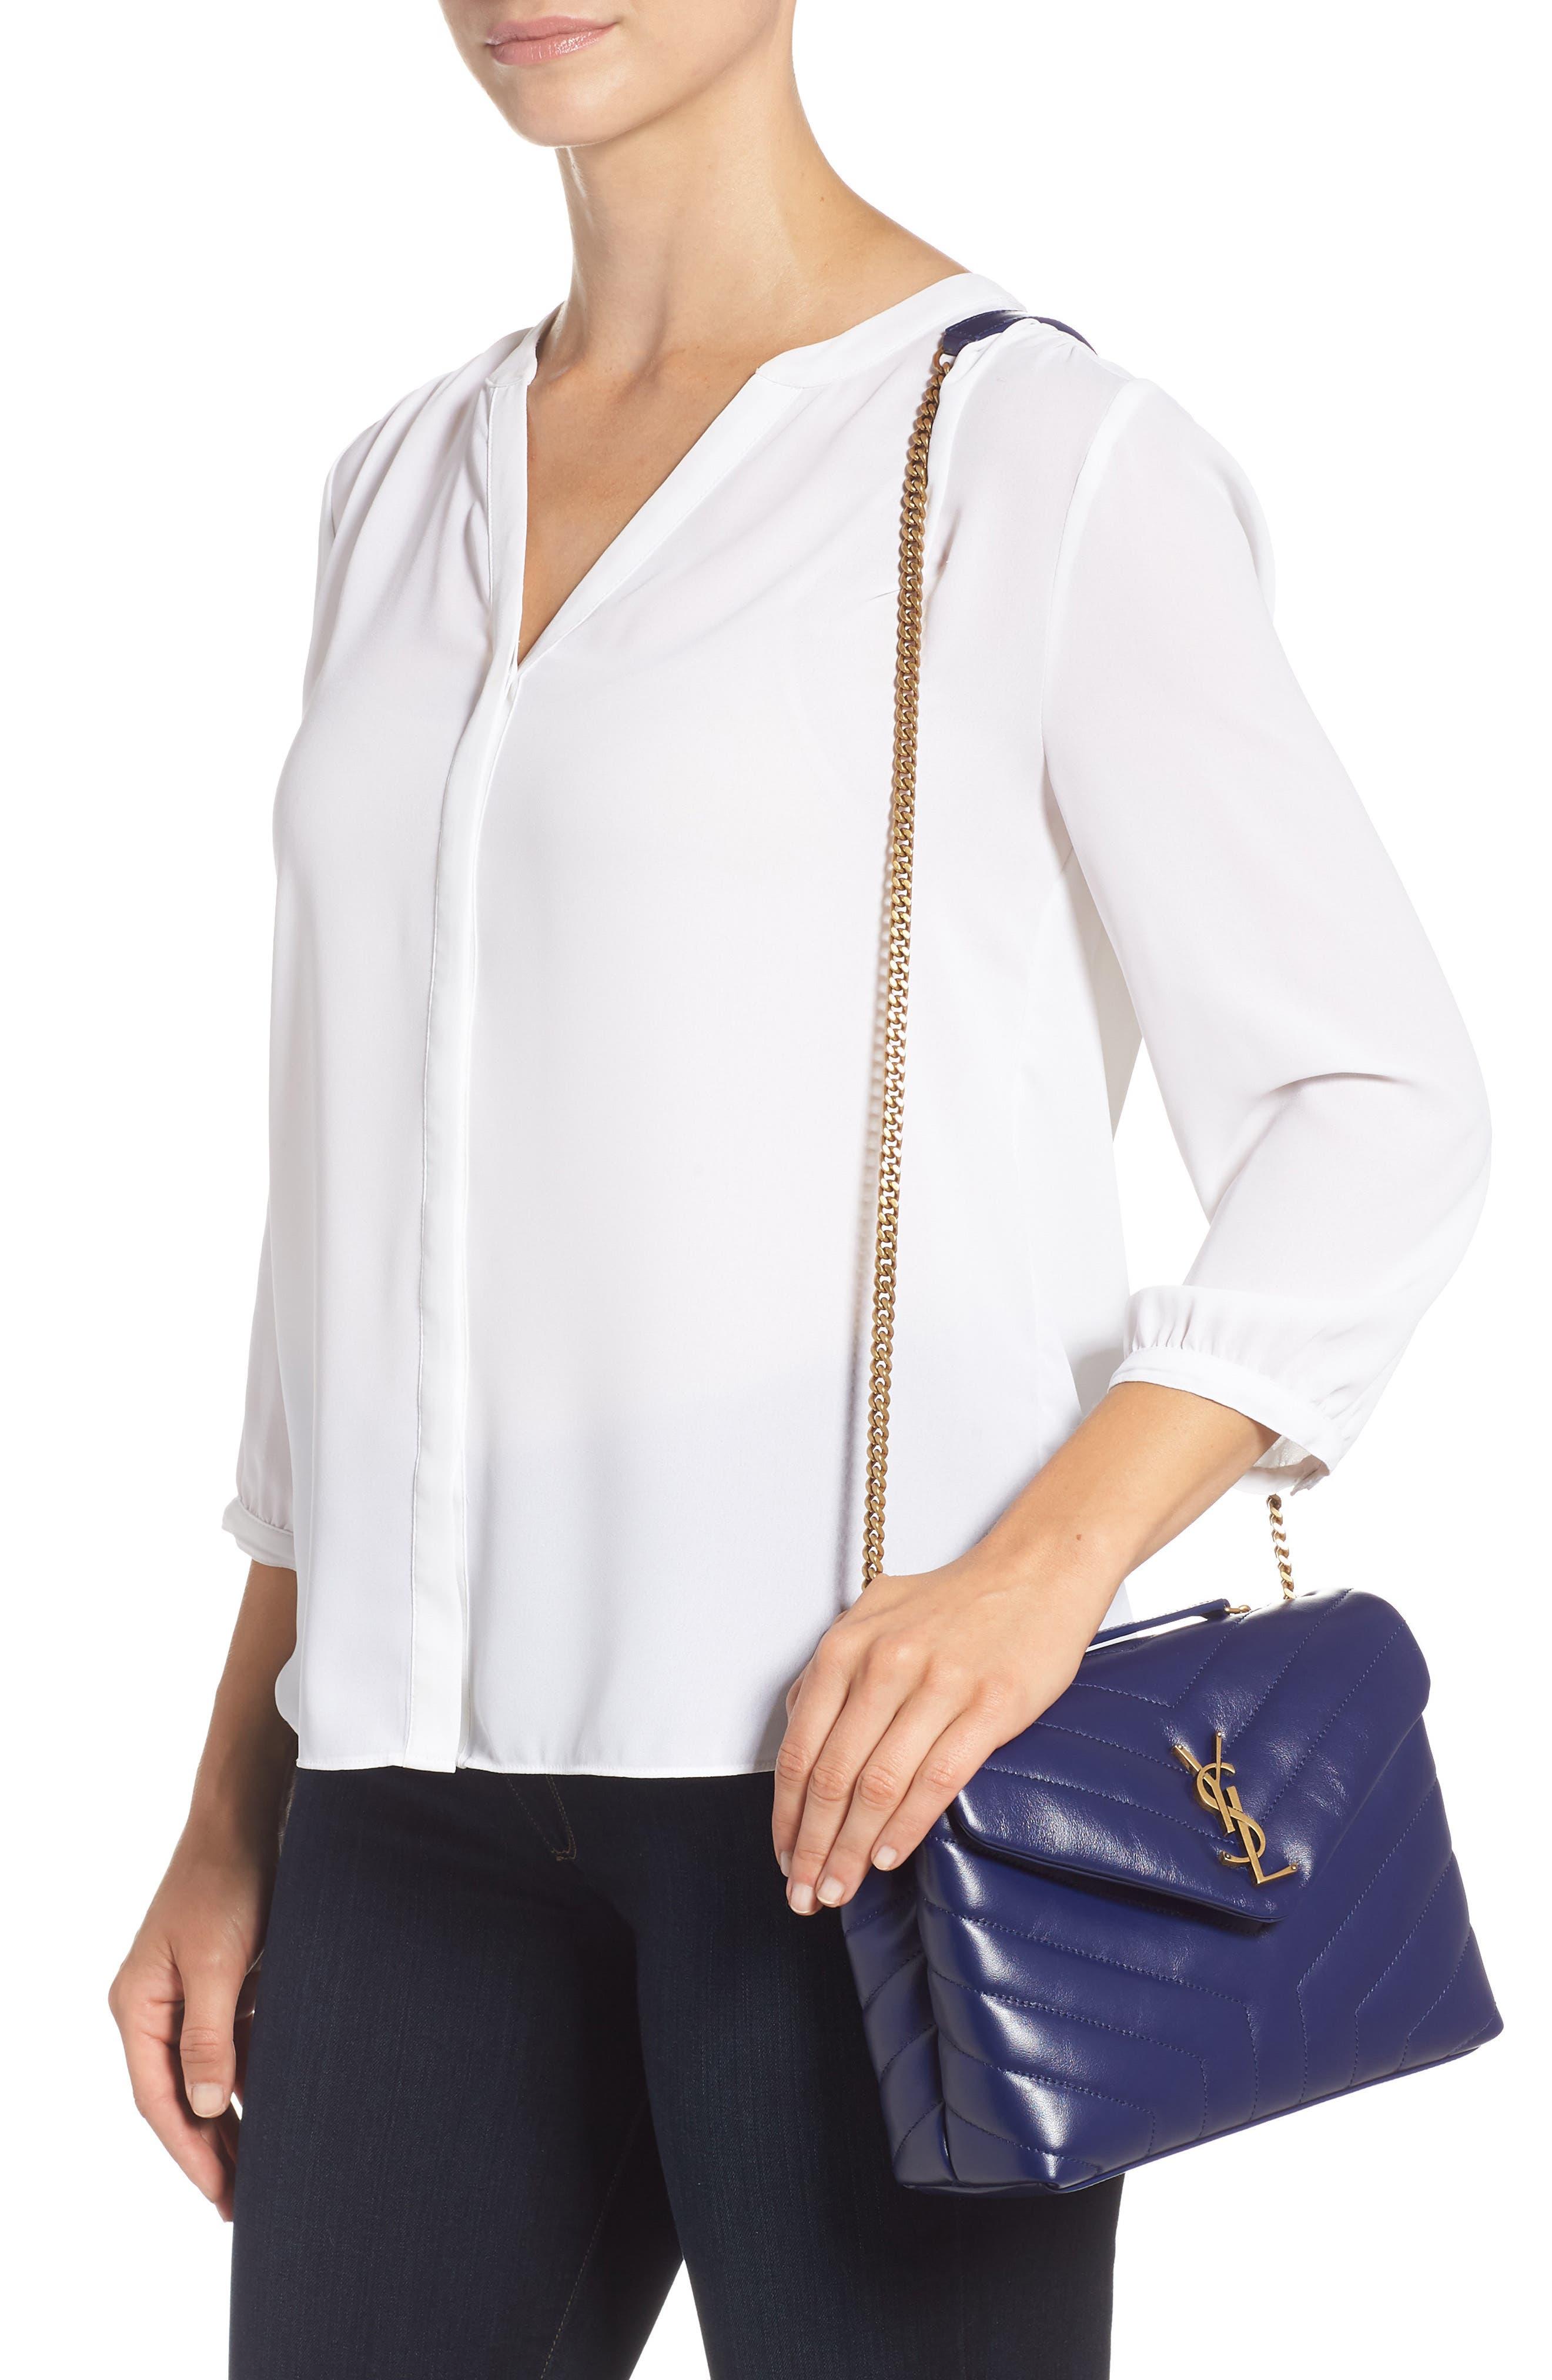 ,                             Small Loulou Leather Shoulder Bag,                             Alternate thumbnail 23, color,                             402